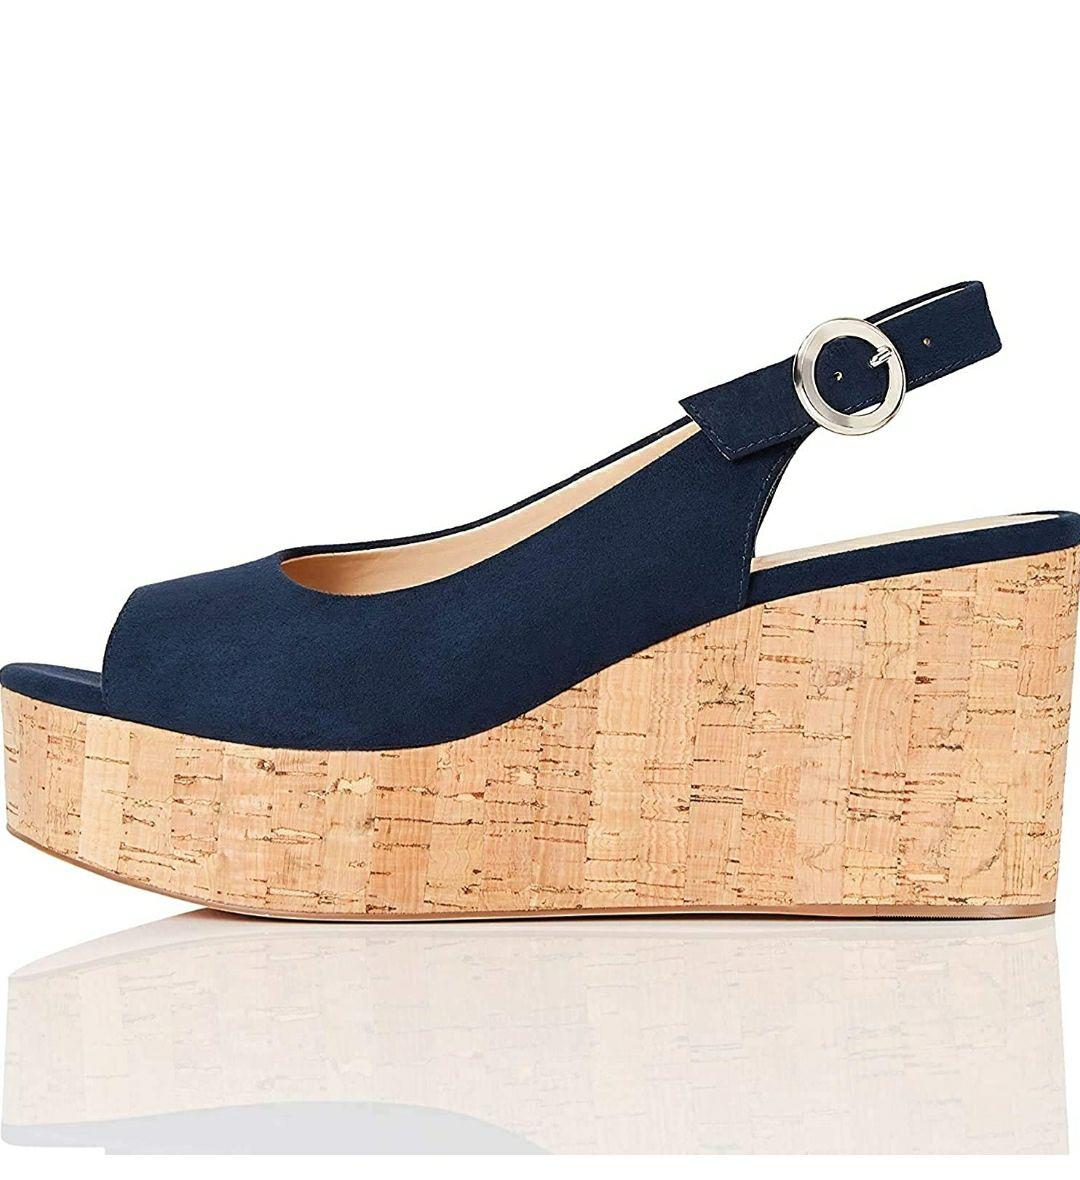 TALLA 40 - Marca Amazon - find. Scuba-s-1a-5 - Zapatos de tacón con punta abierta Mujer Azul Navy